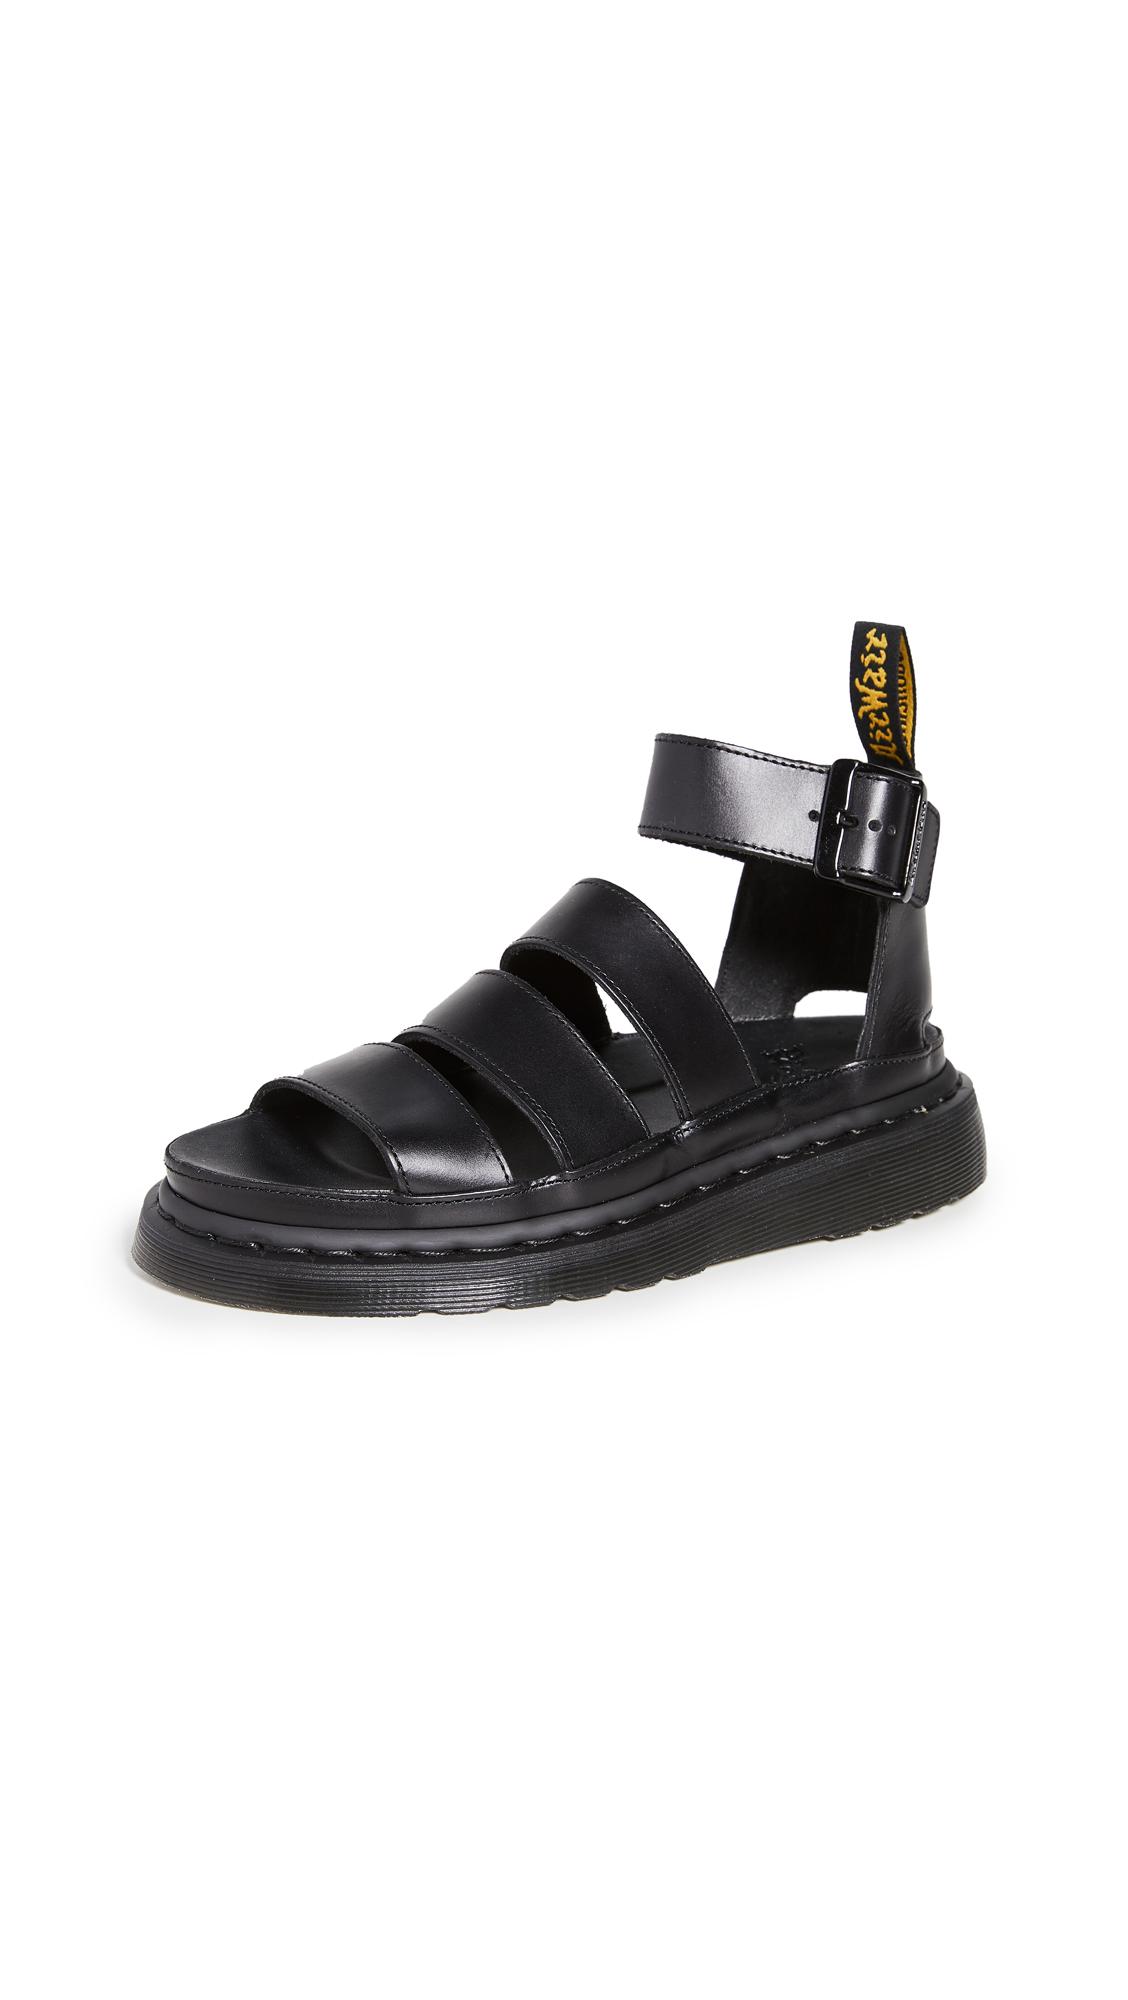 Buy Dr. Martens Clarissa II Sandals online, shop Dr. Martens